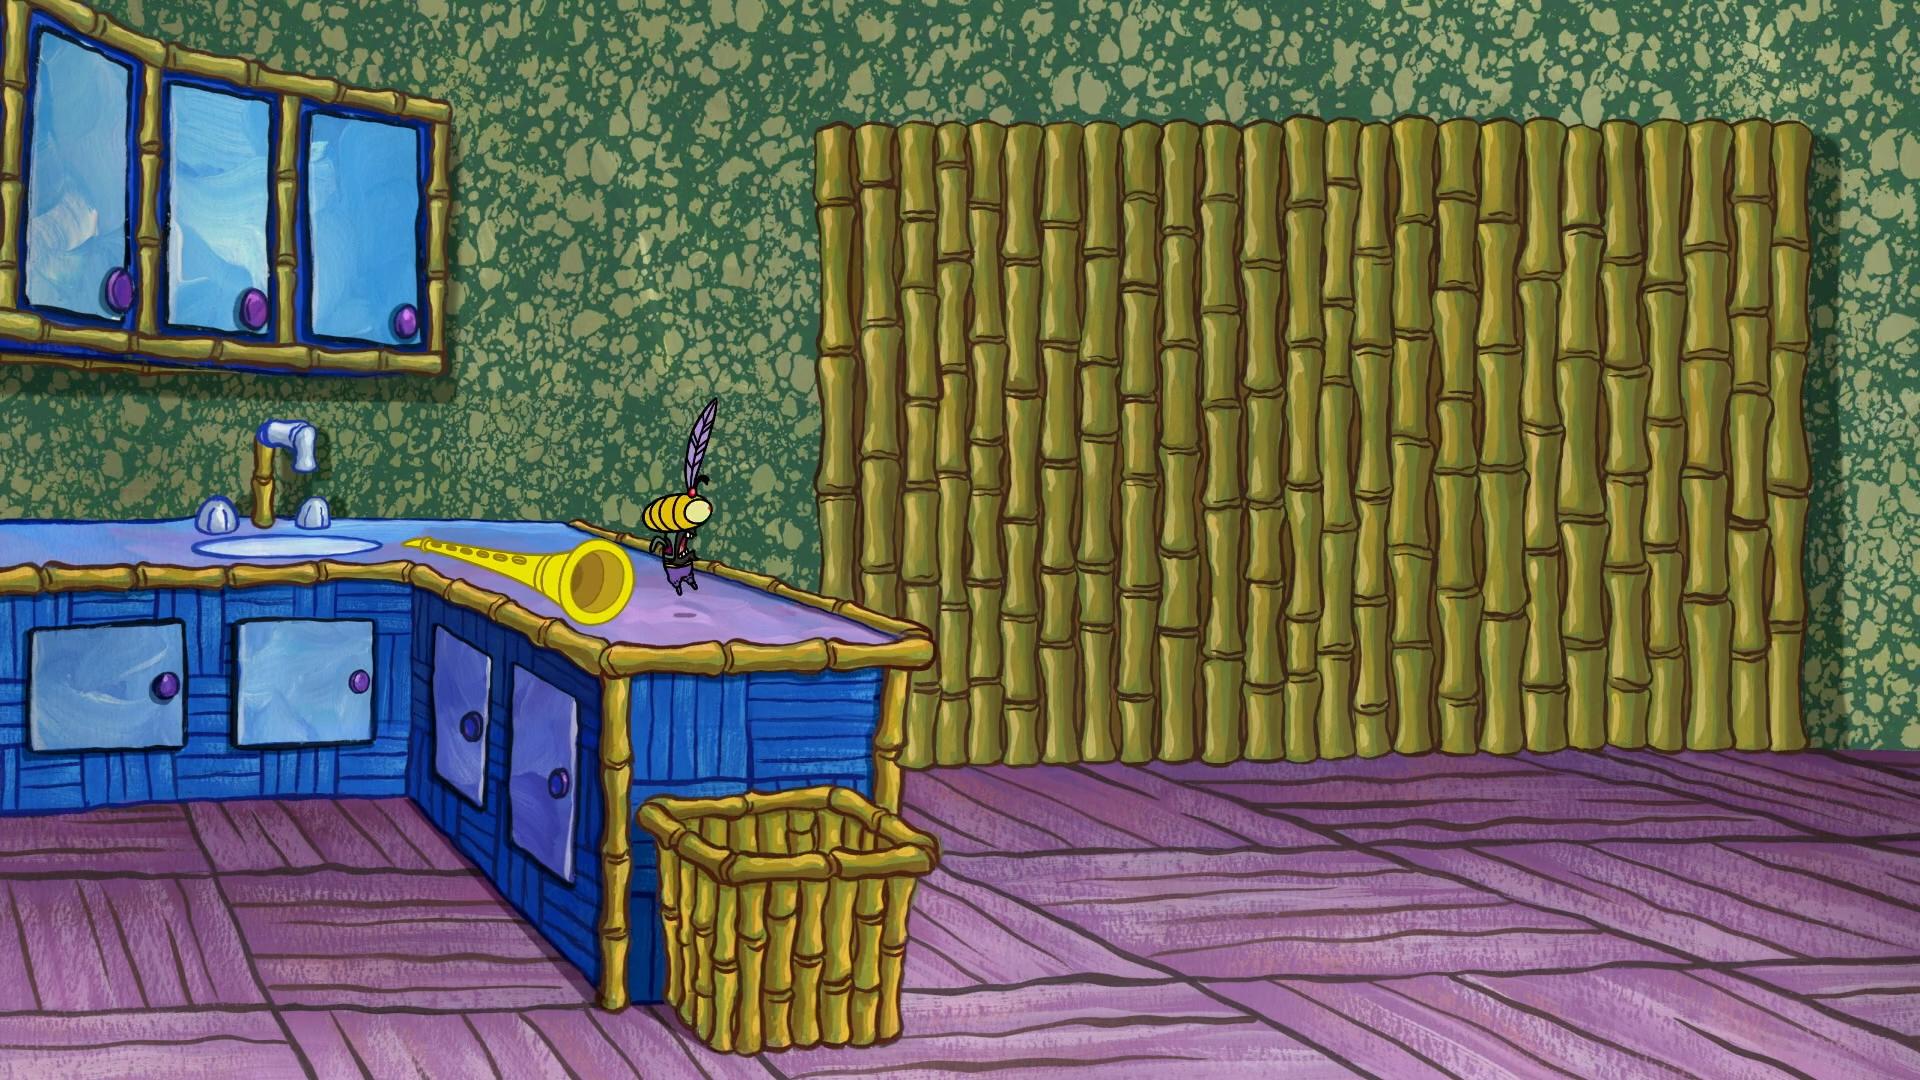 First Nautical Bank Encyclopedia Spongebobia Fandom Powered By Wikia